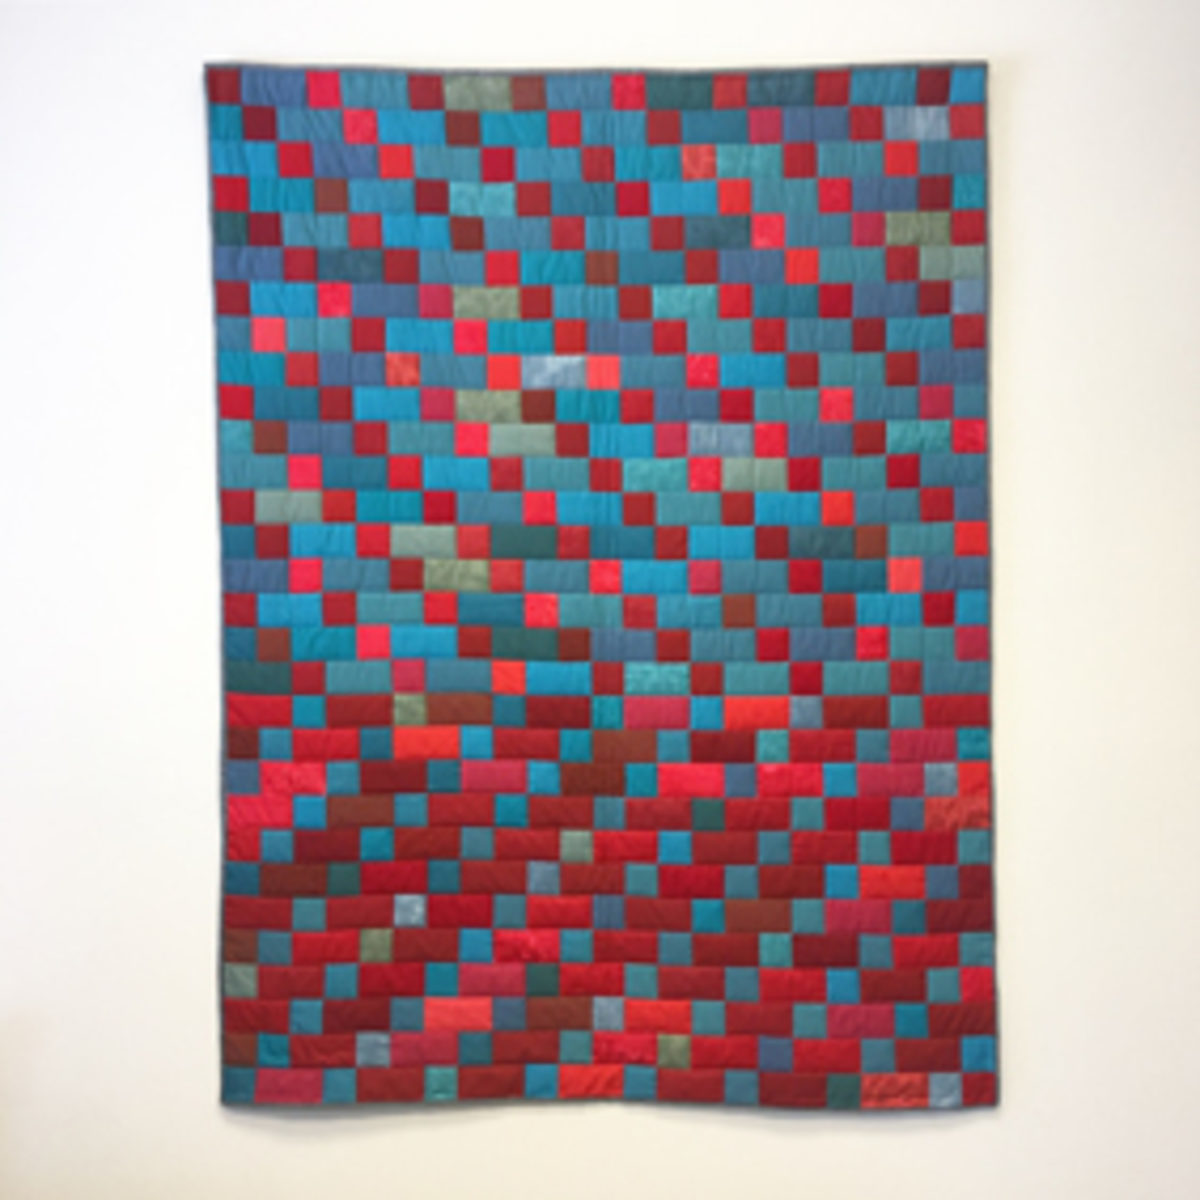 Cross-Quarter-Embrace-v1-Erick Wolfmeyer